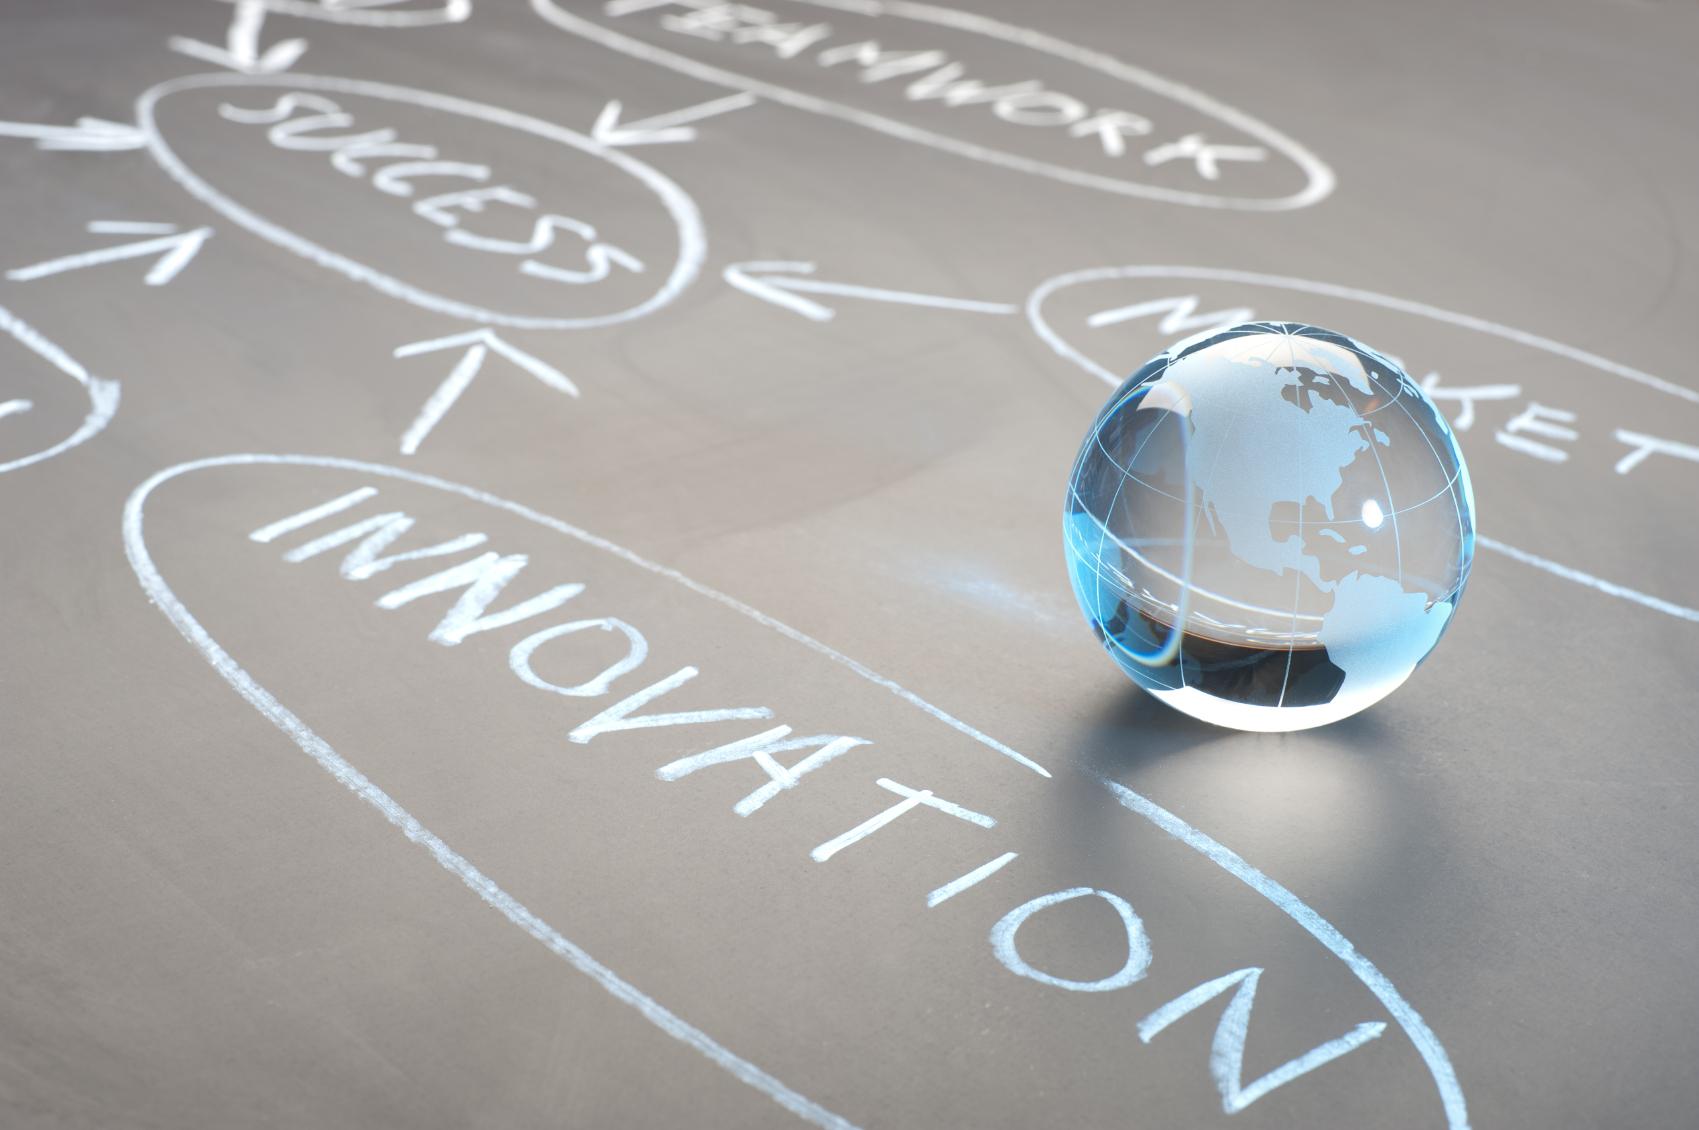 Empresas de Base Tecnológica - Impúlsame